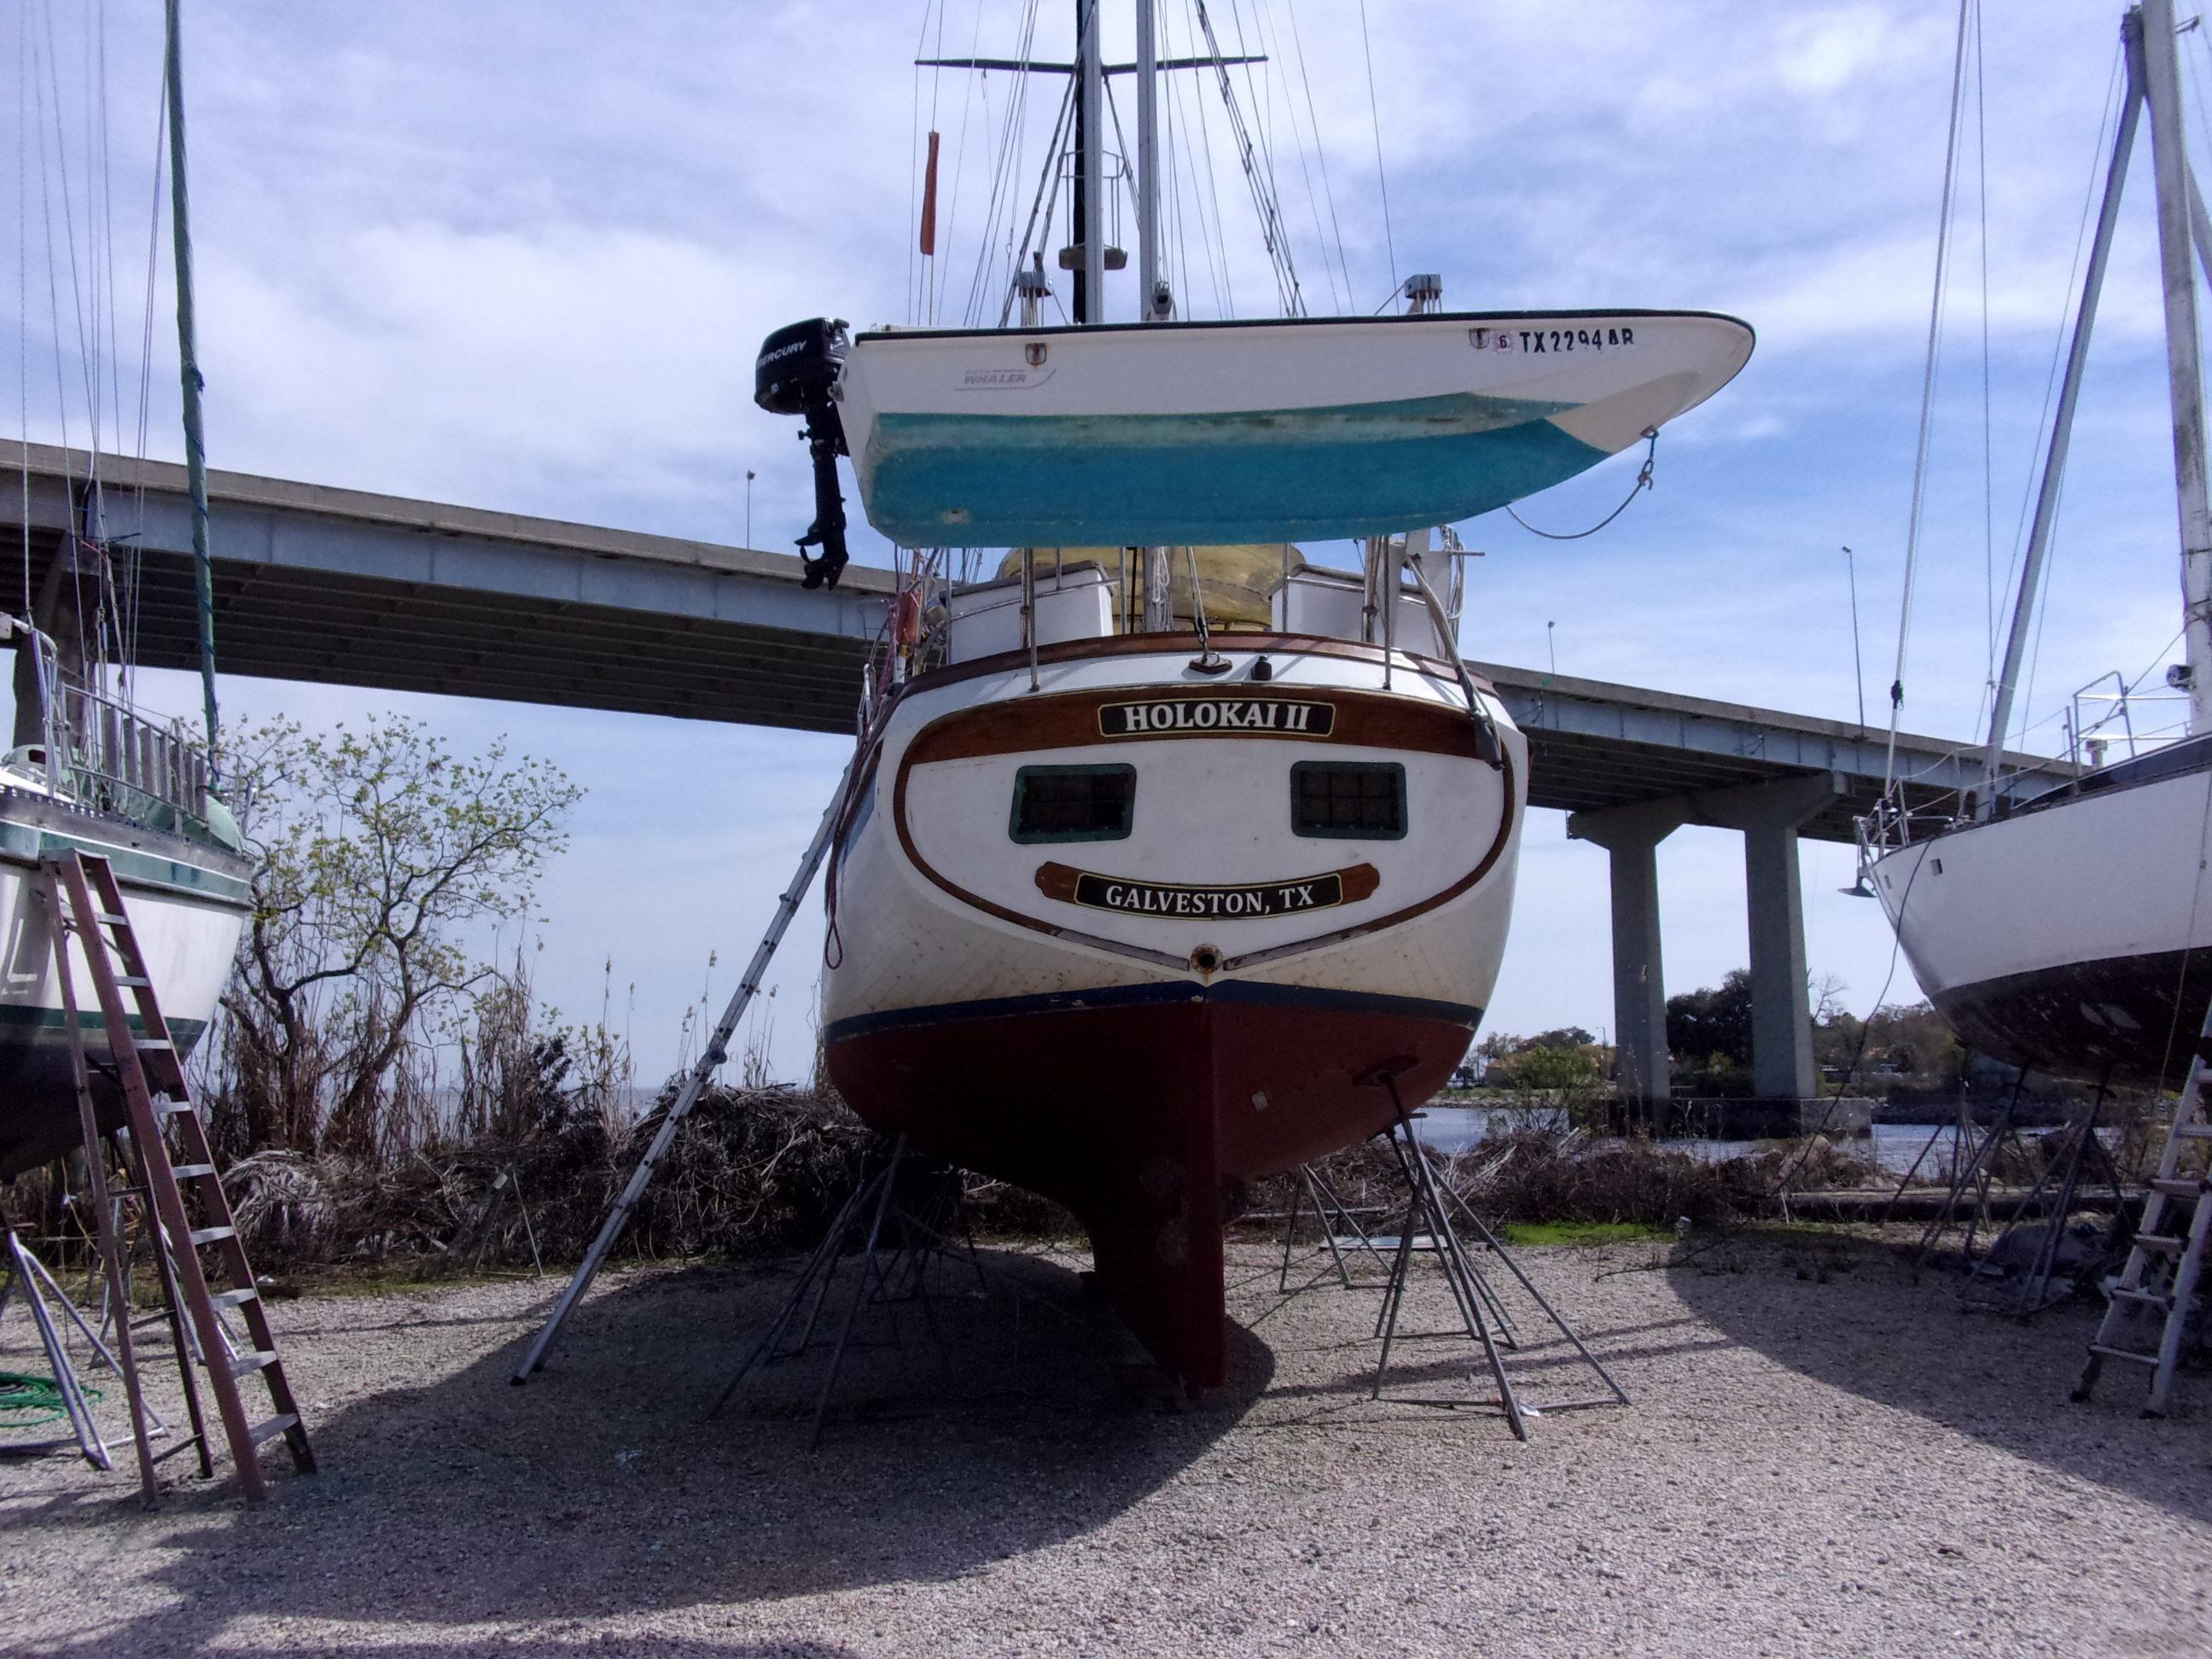 1980 Vagabond 47 Cc Ketch Sail Boat For Sale Www